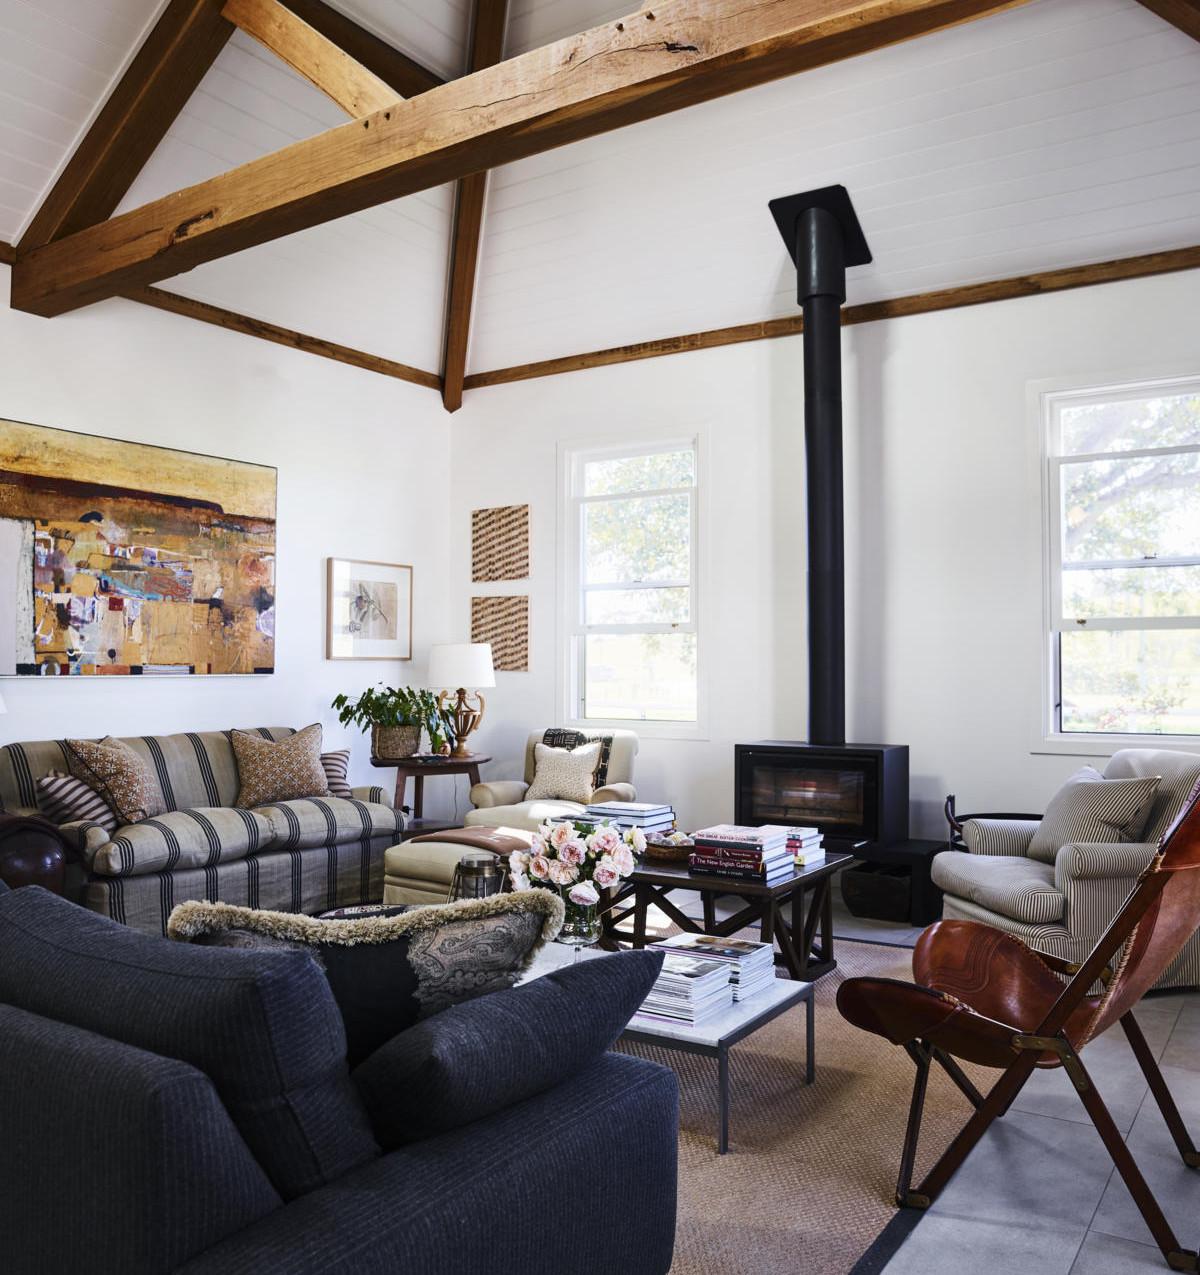 The Farmhouse Family Room